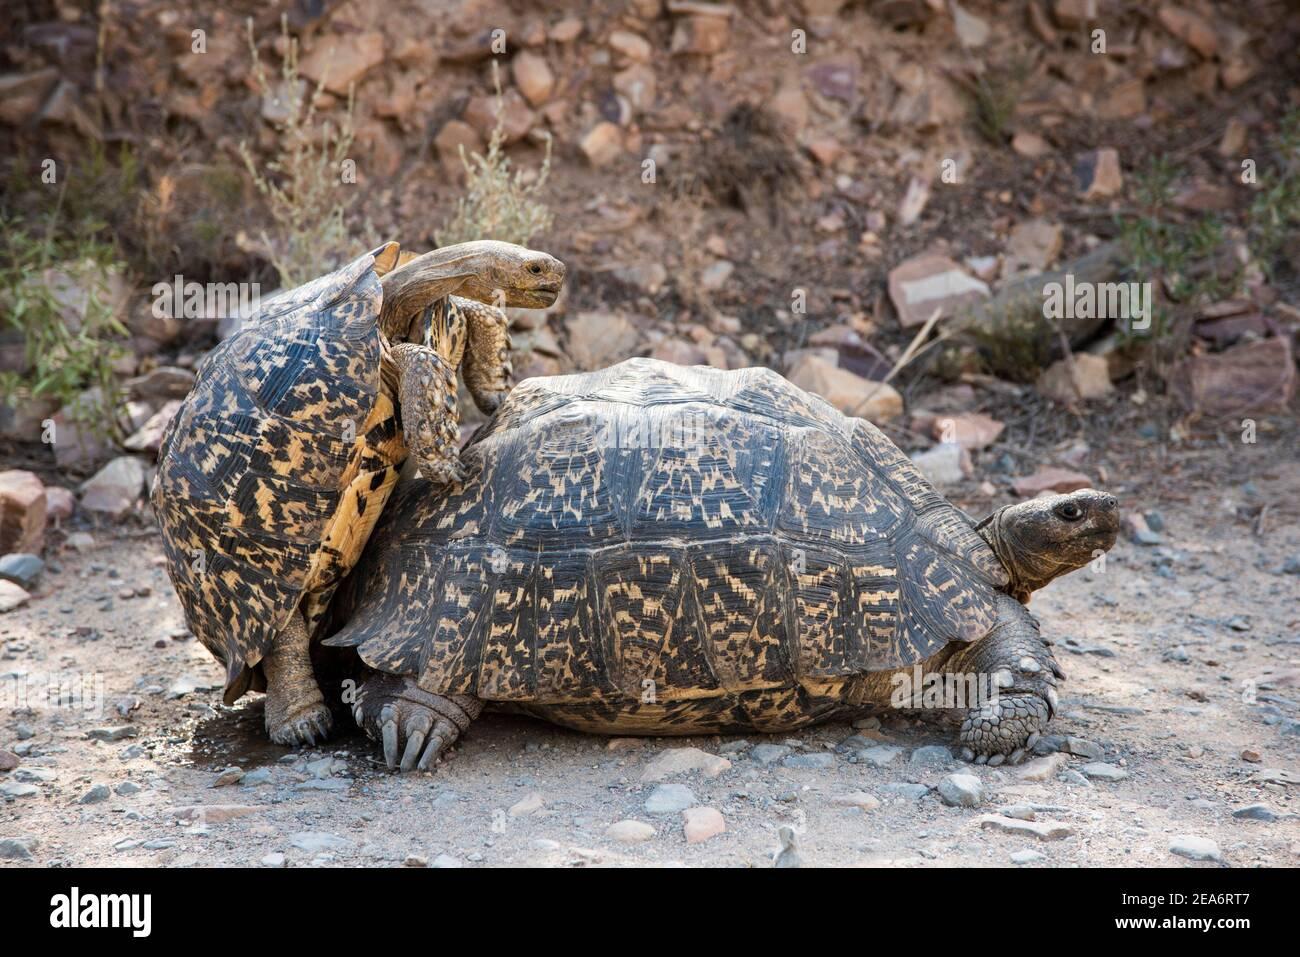 Leopard Schildkröte Paarung, Geochelone pardalis, Baviaanskloof, Südafrika Stockfoto